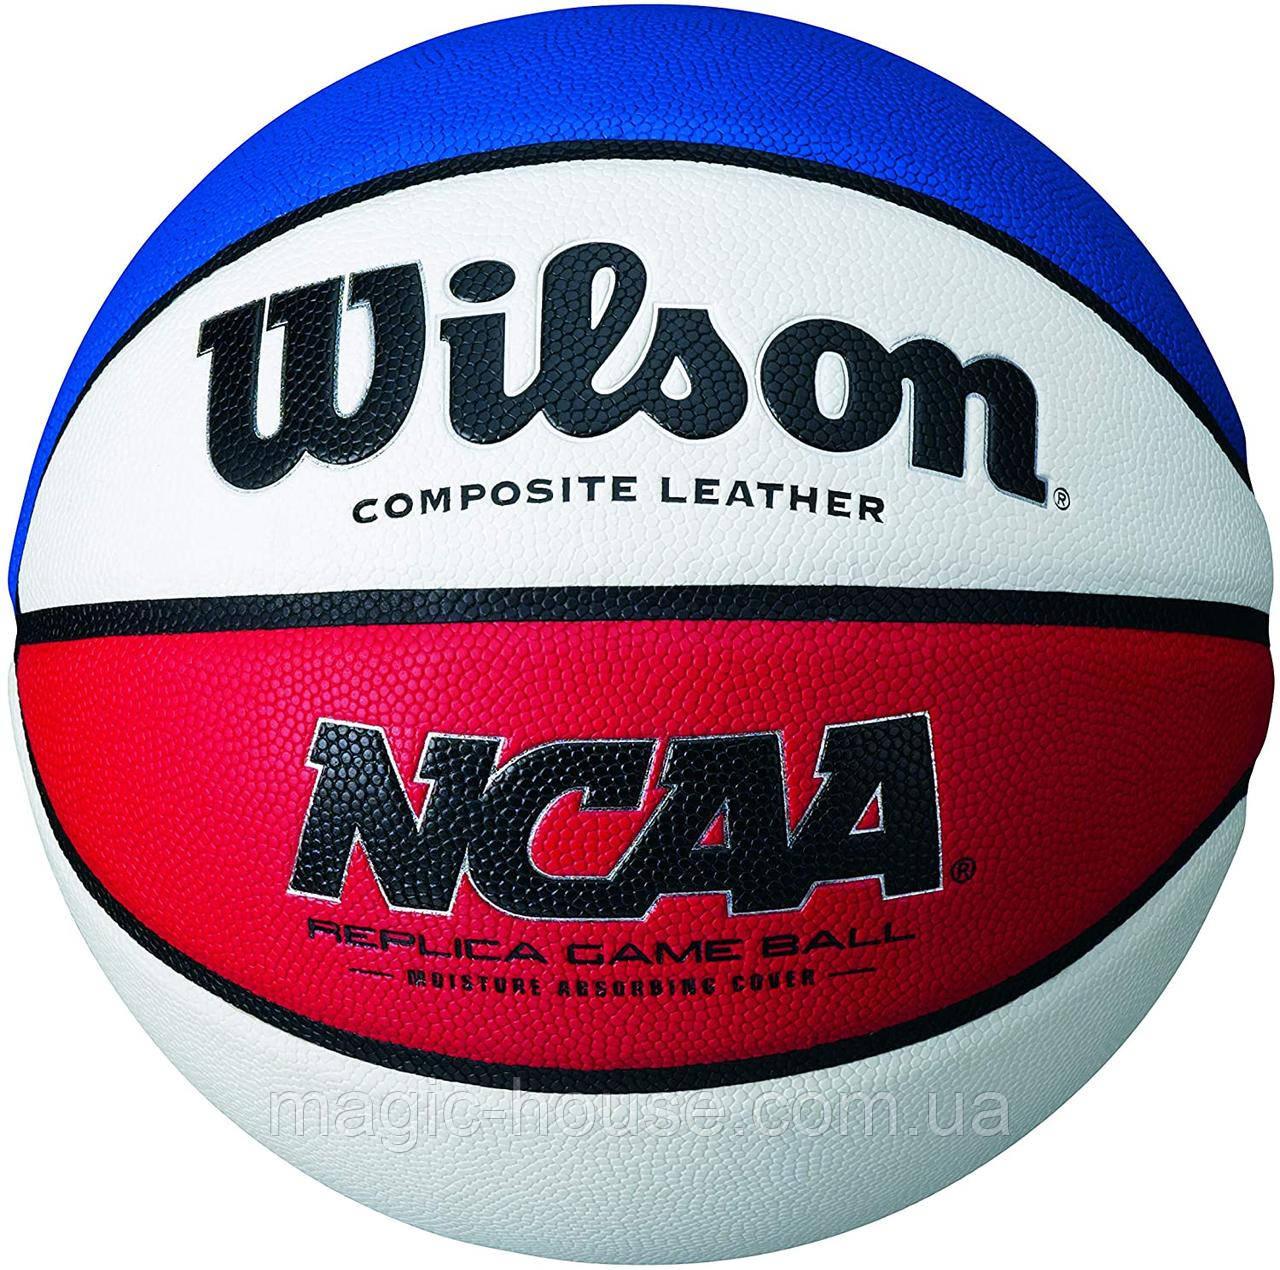 Wilson NCAA USA Replica Basketball Game М'яч баскетбольний вілсон оригінал розмір 7 композитна шкіра